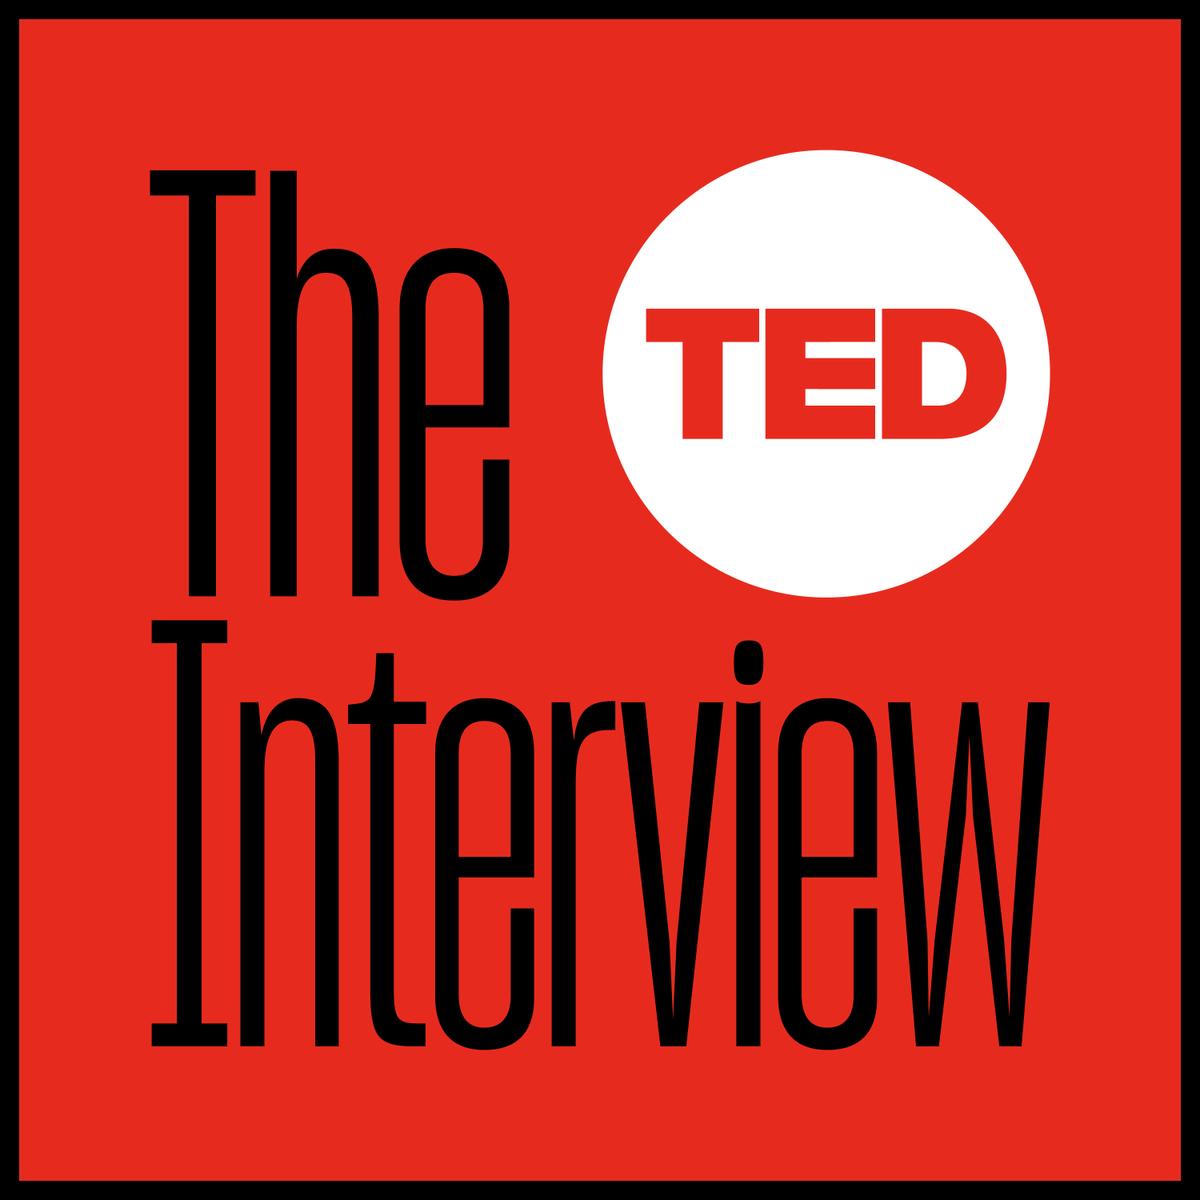 Kai-Fu Lee on the future of AI #theTedInterview http://podplayer.net/?id=72613994 via @PodcastAddict